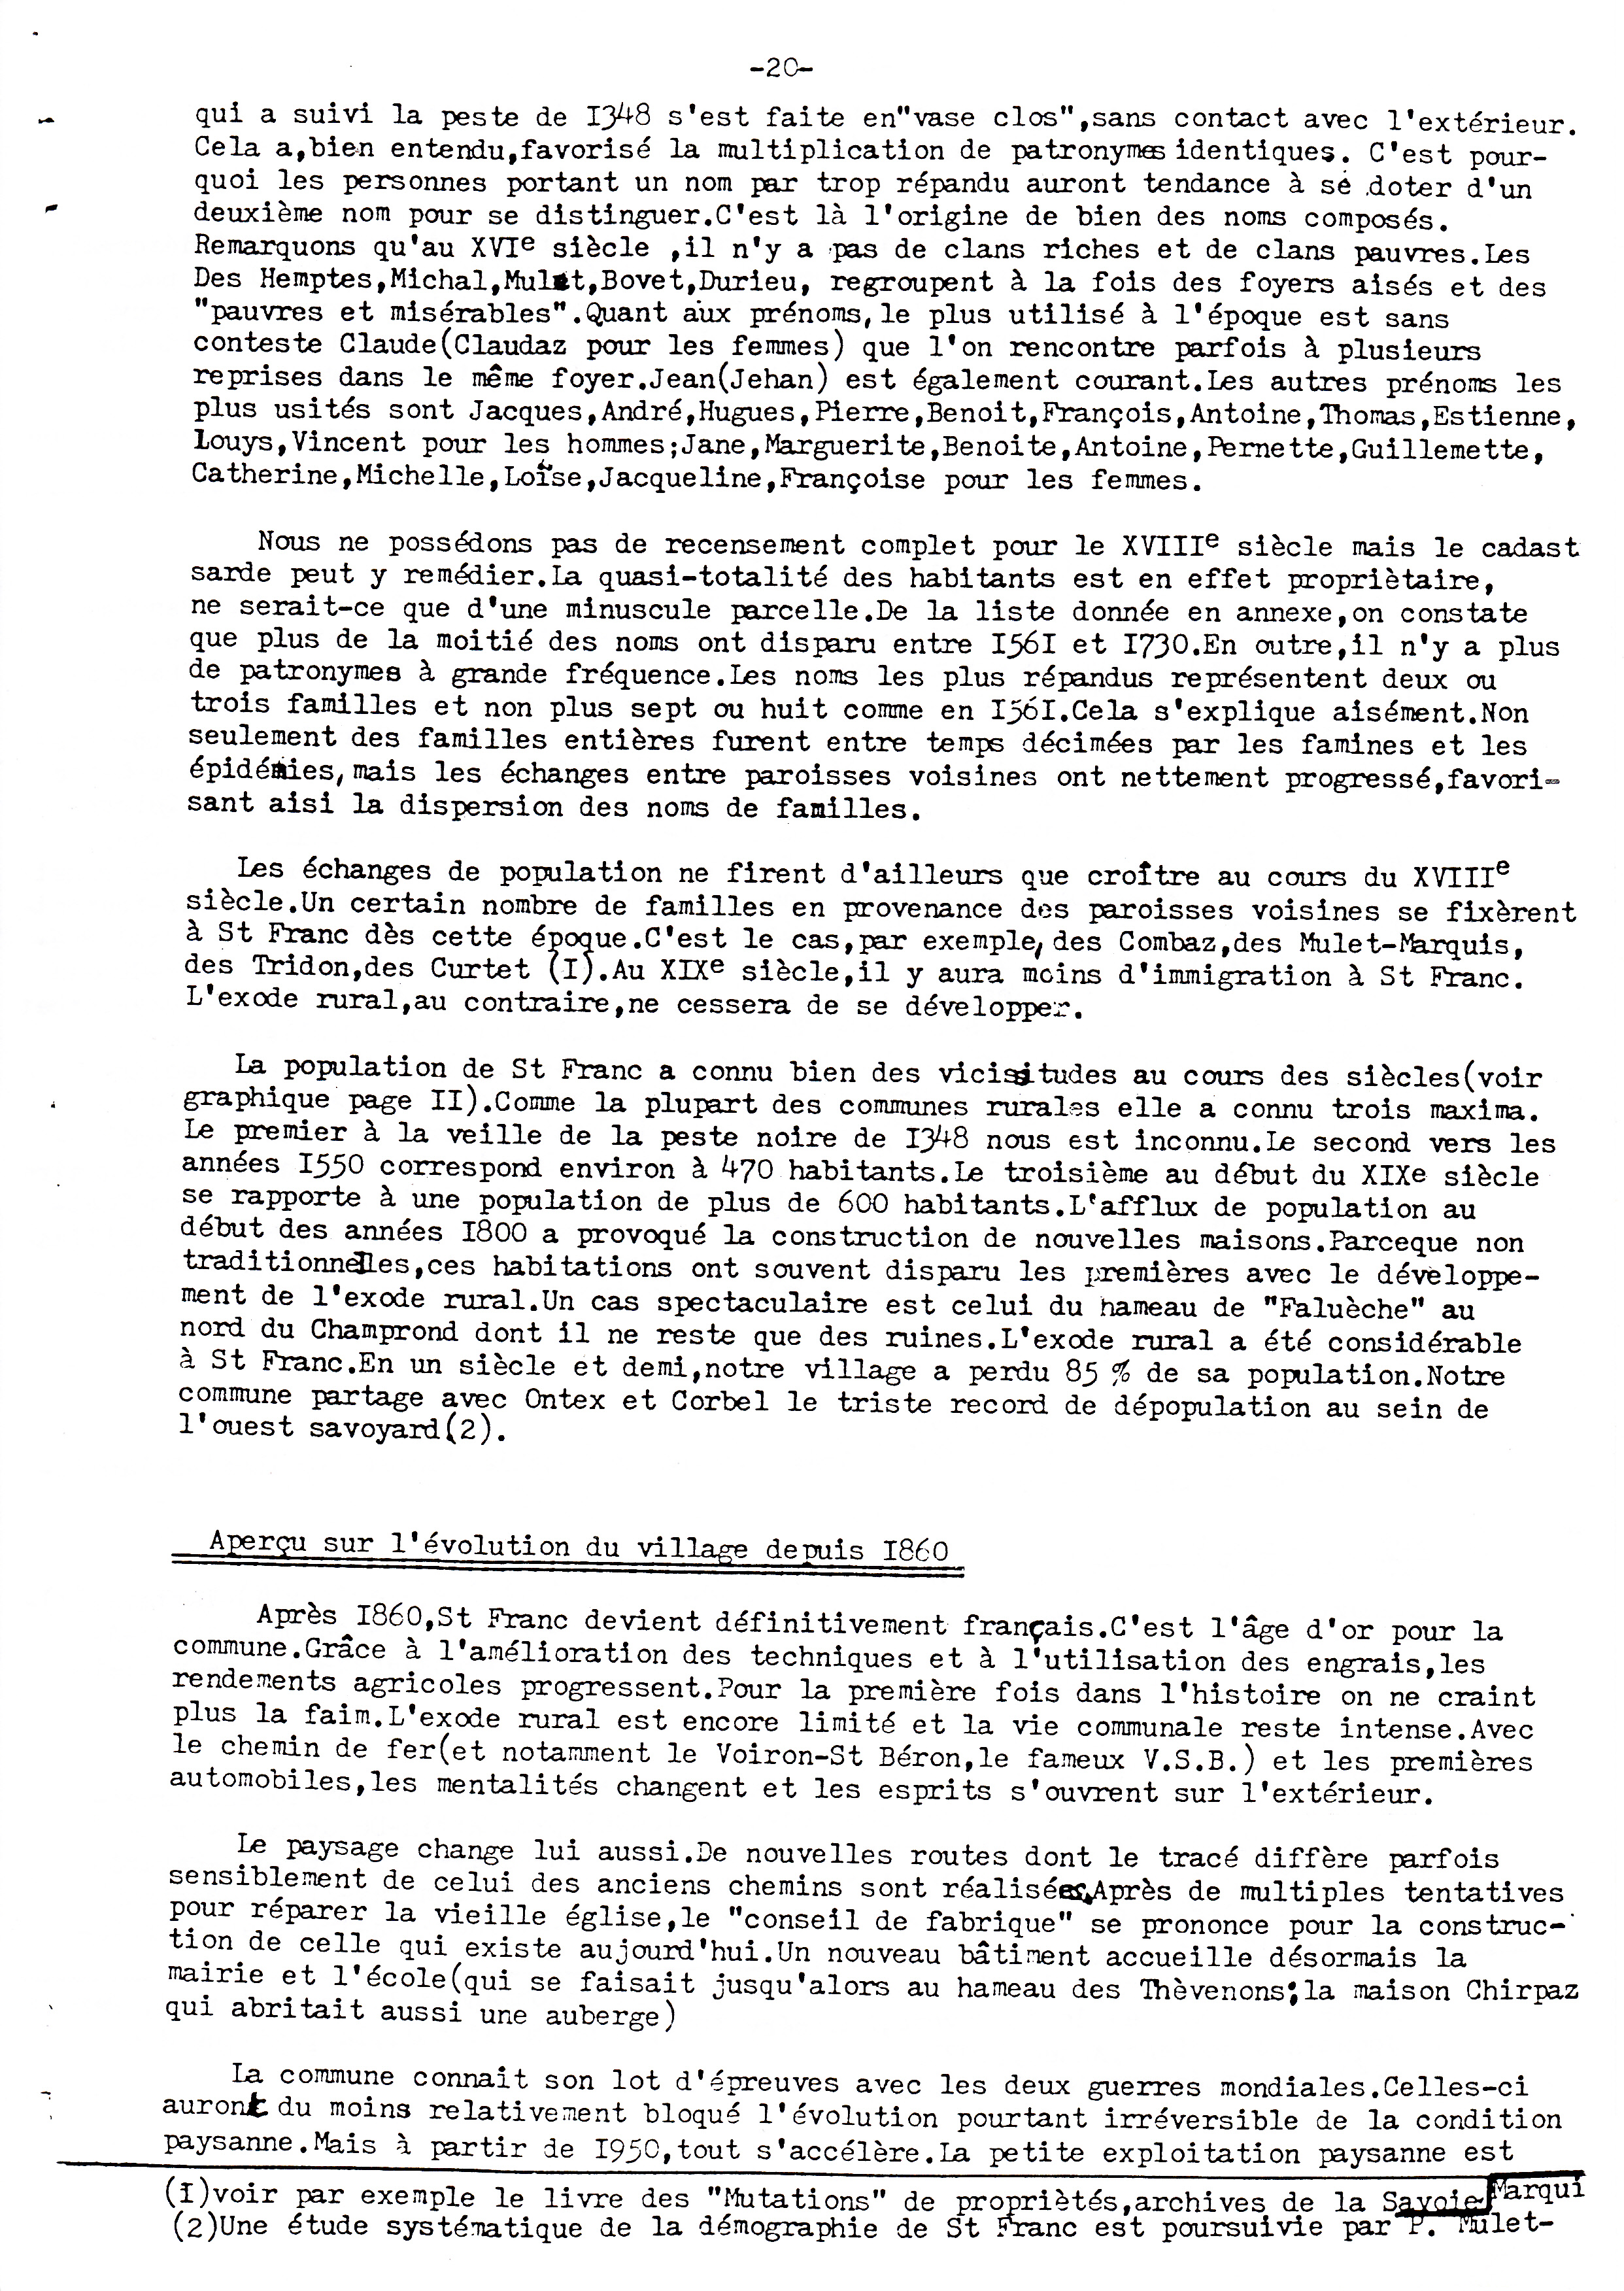 L.P.H.D.S.F. Page 20.jpg